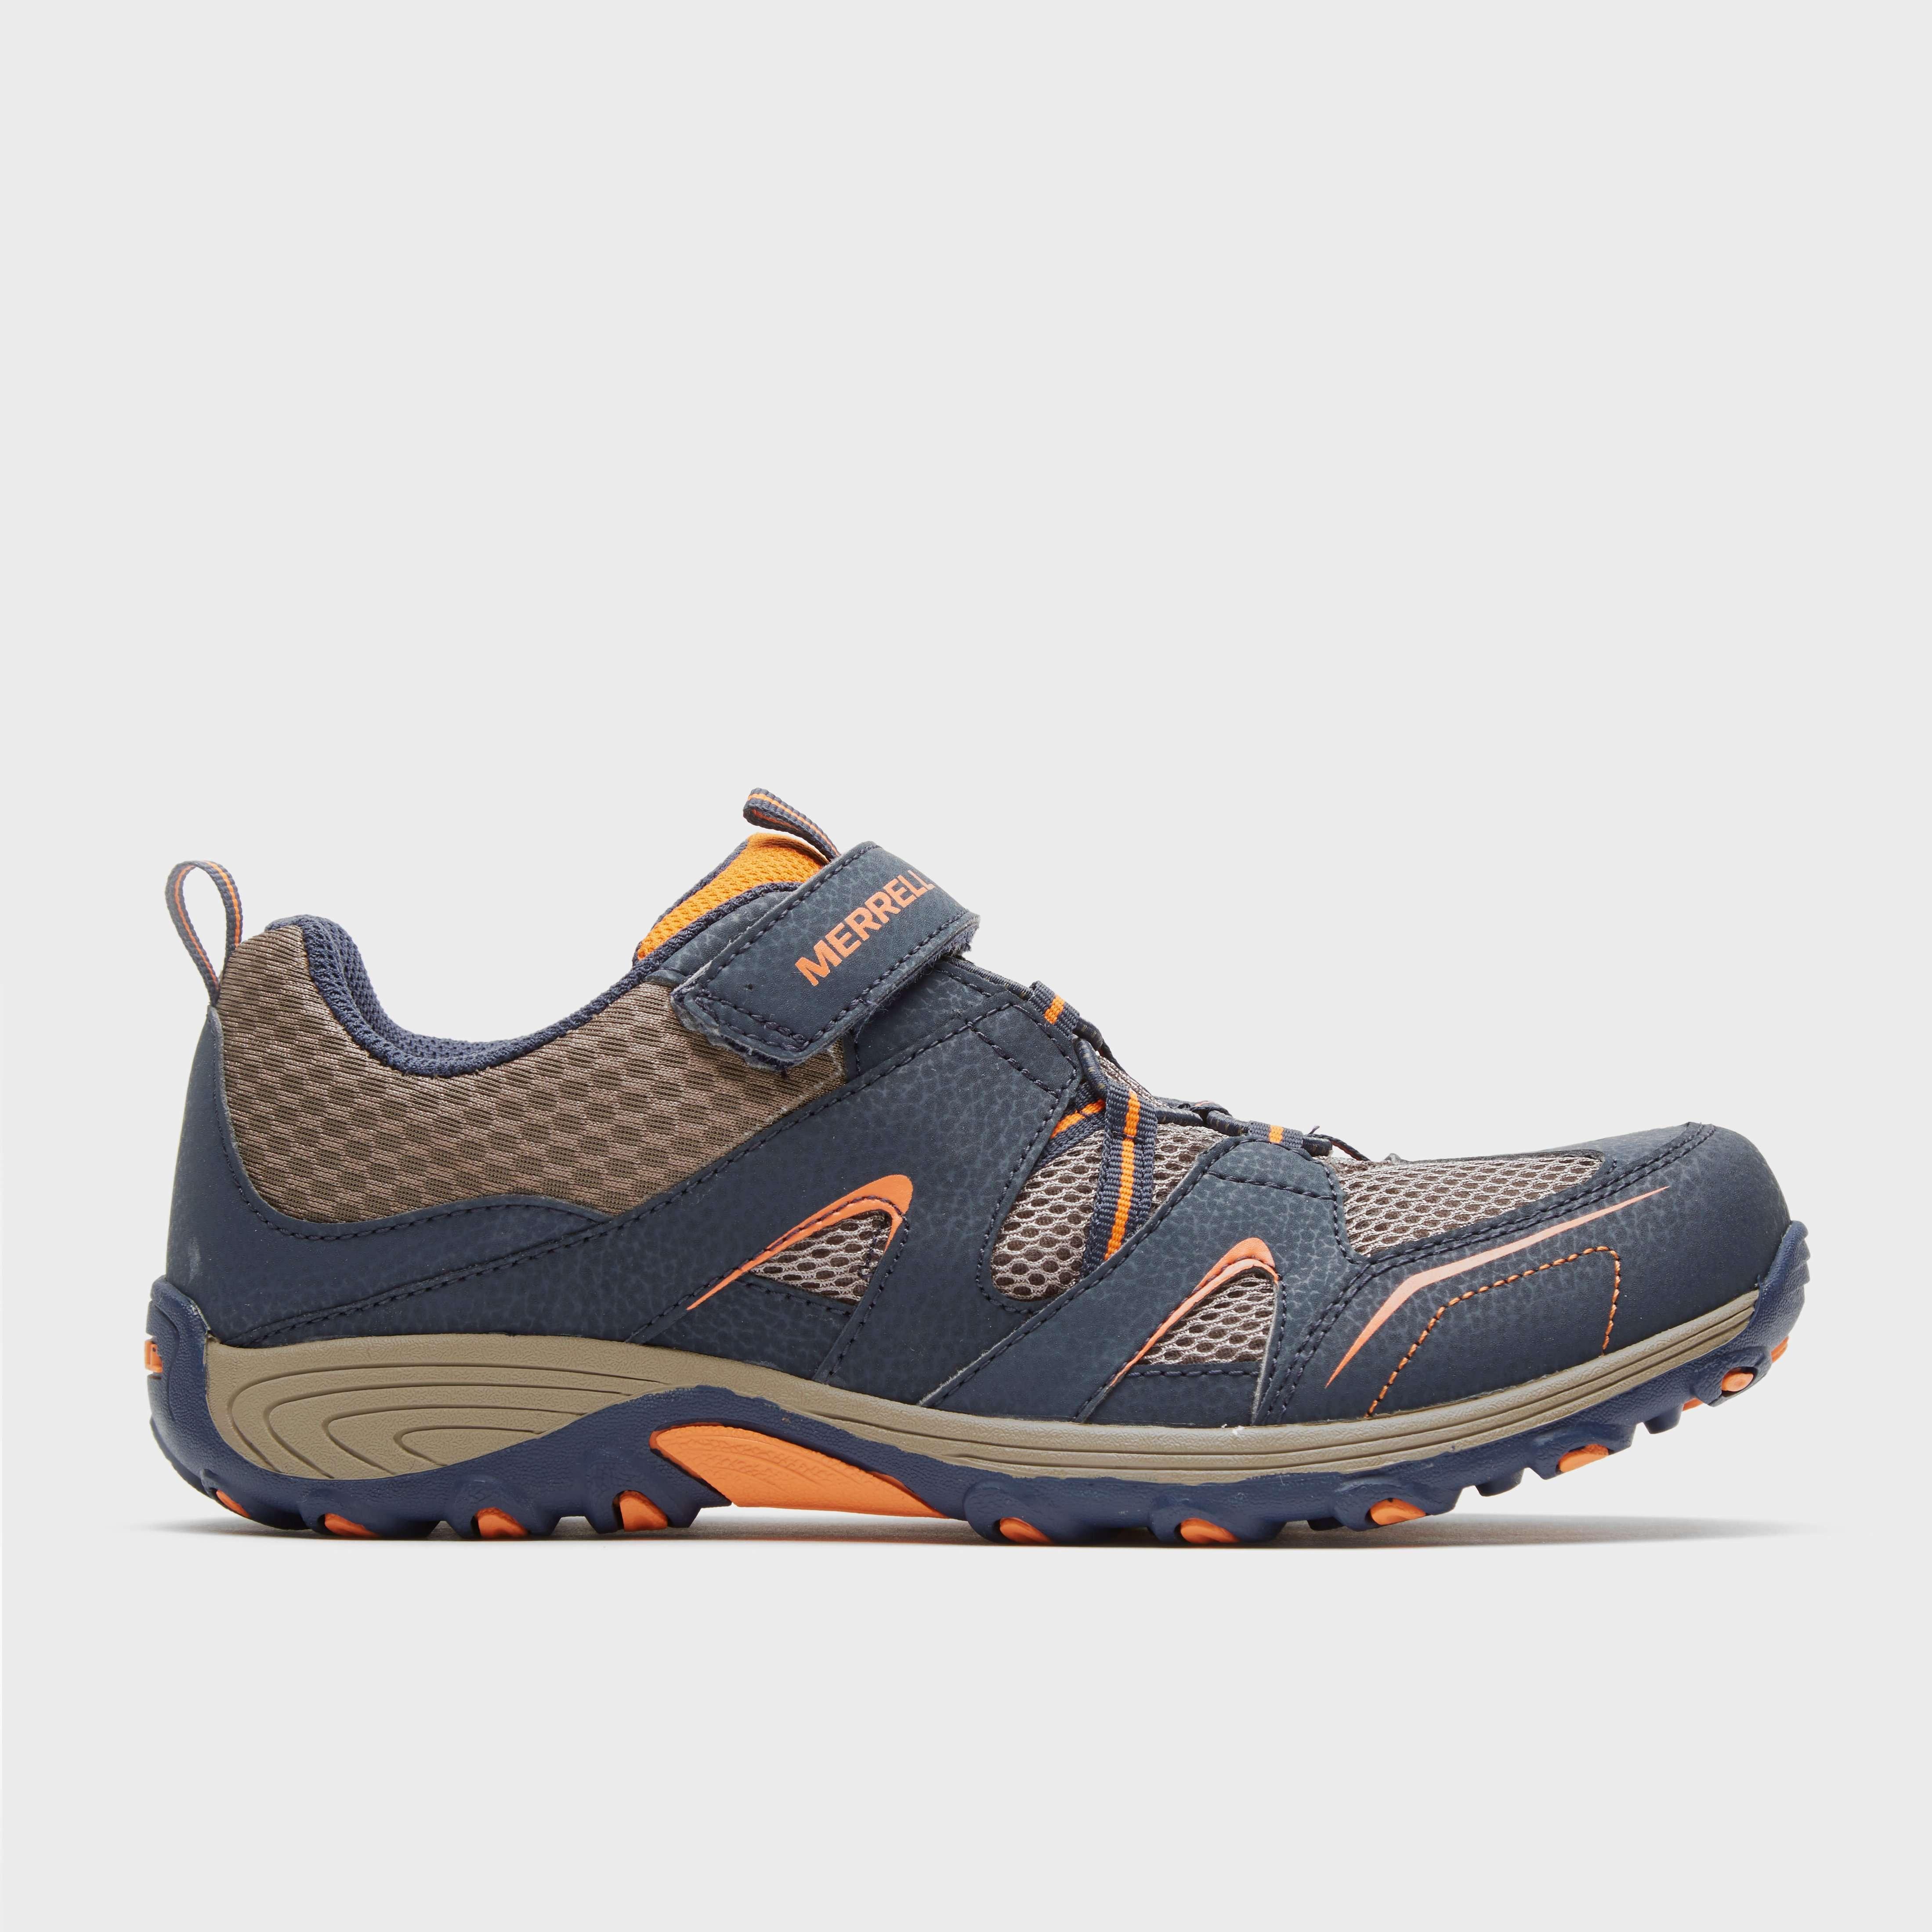 MERRELL Girl's Trail Chaser Walking Shoes